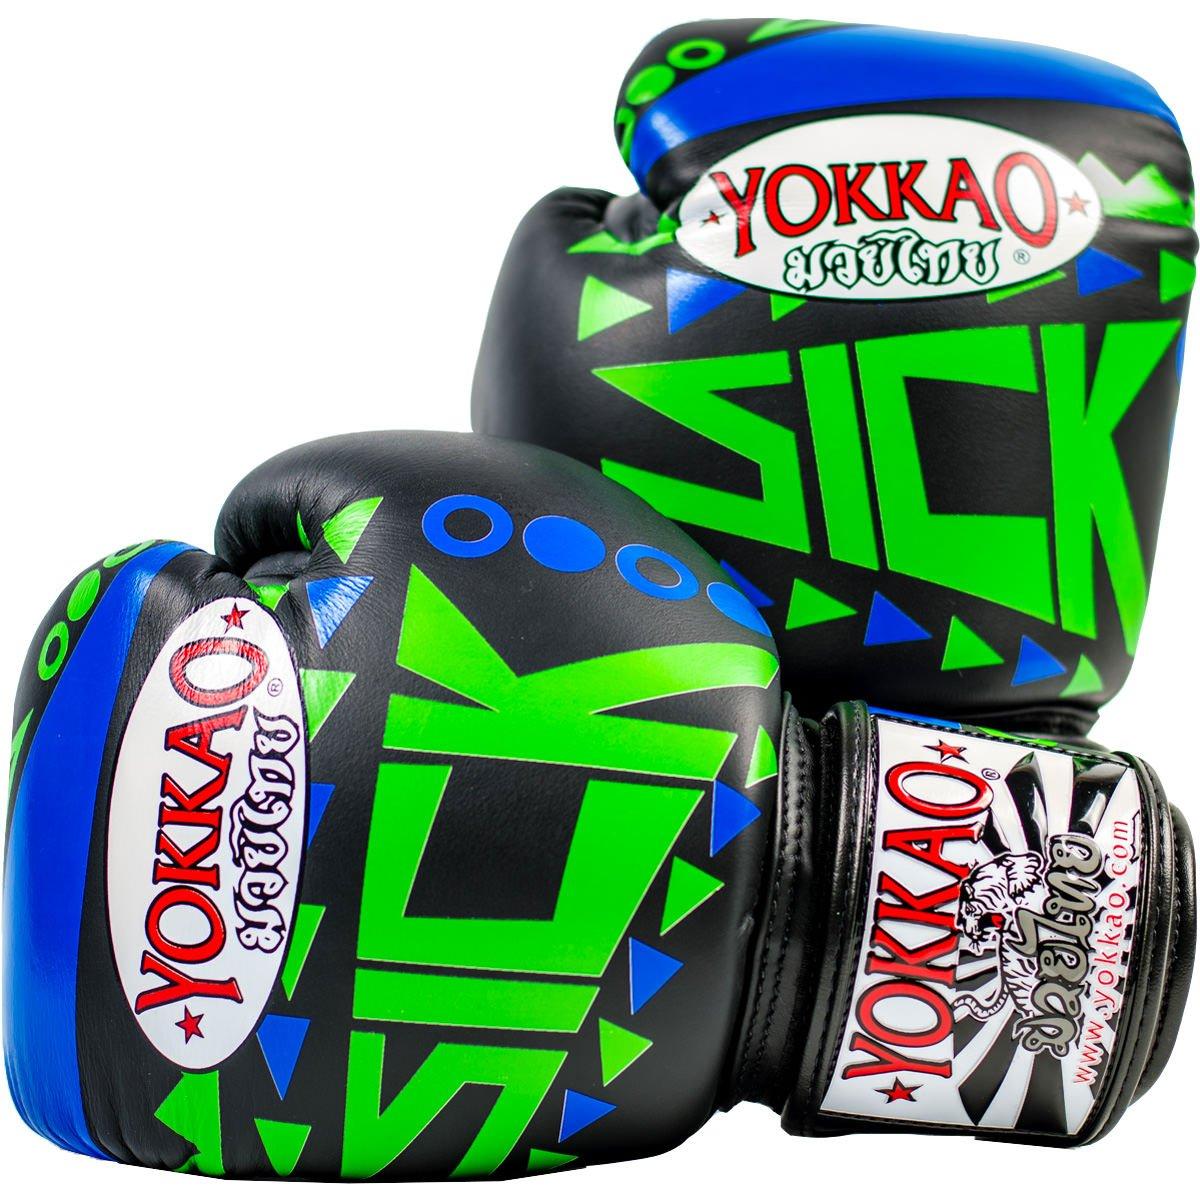 Yokkao Sickタイ式ボクシンググローブブルー/グリーン、キックボクシング、MMA、格闘技公式ストア 8oz ブラック B07BVMDV31